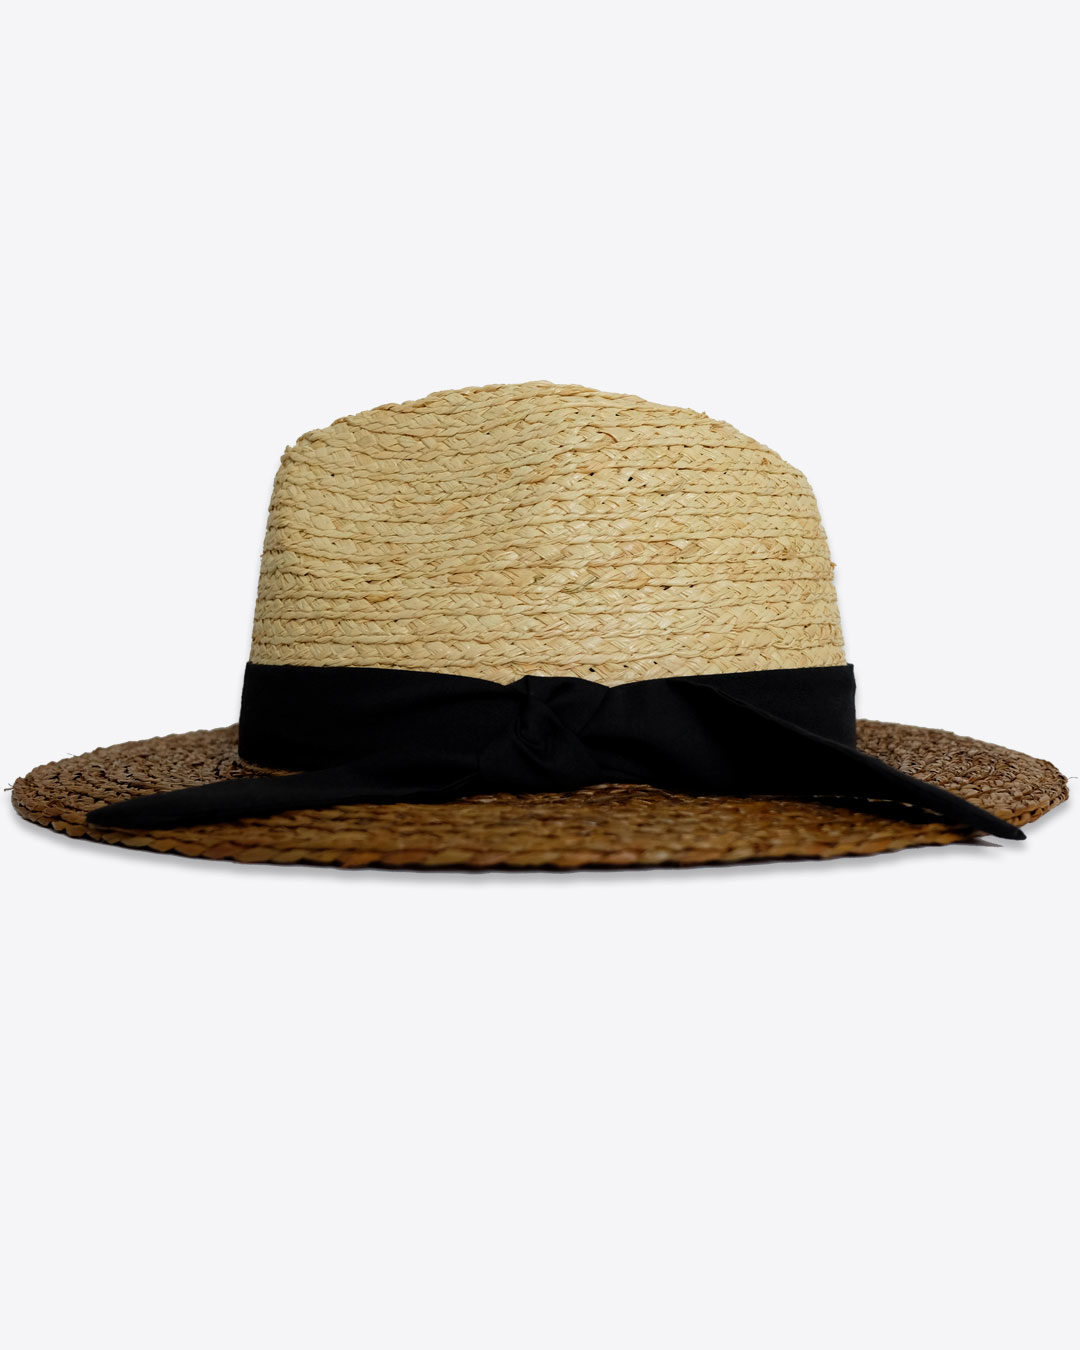 5ed23d98fe2ca Two-Tone Raffia Straw Fedora Hat – URBANE MUSE CHRIS SMITH™